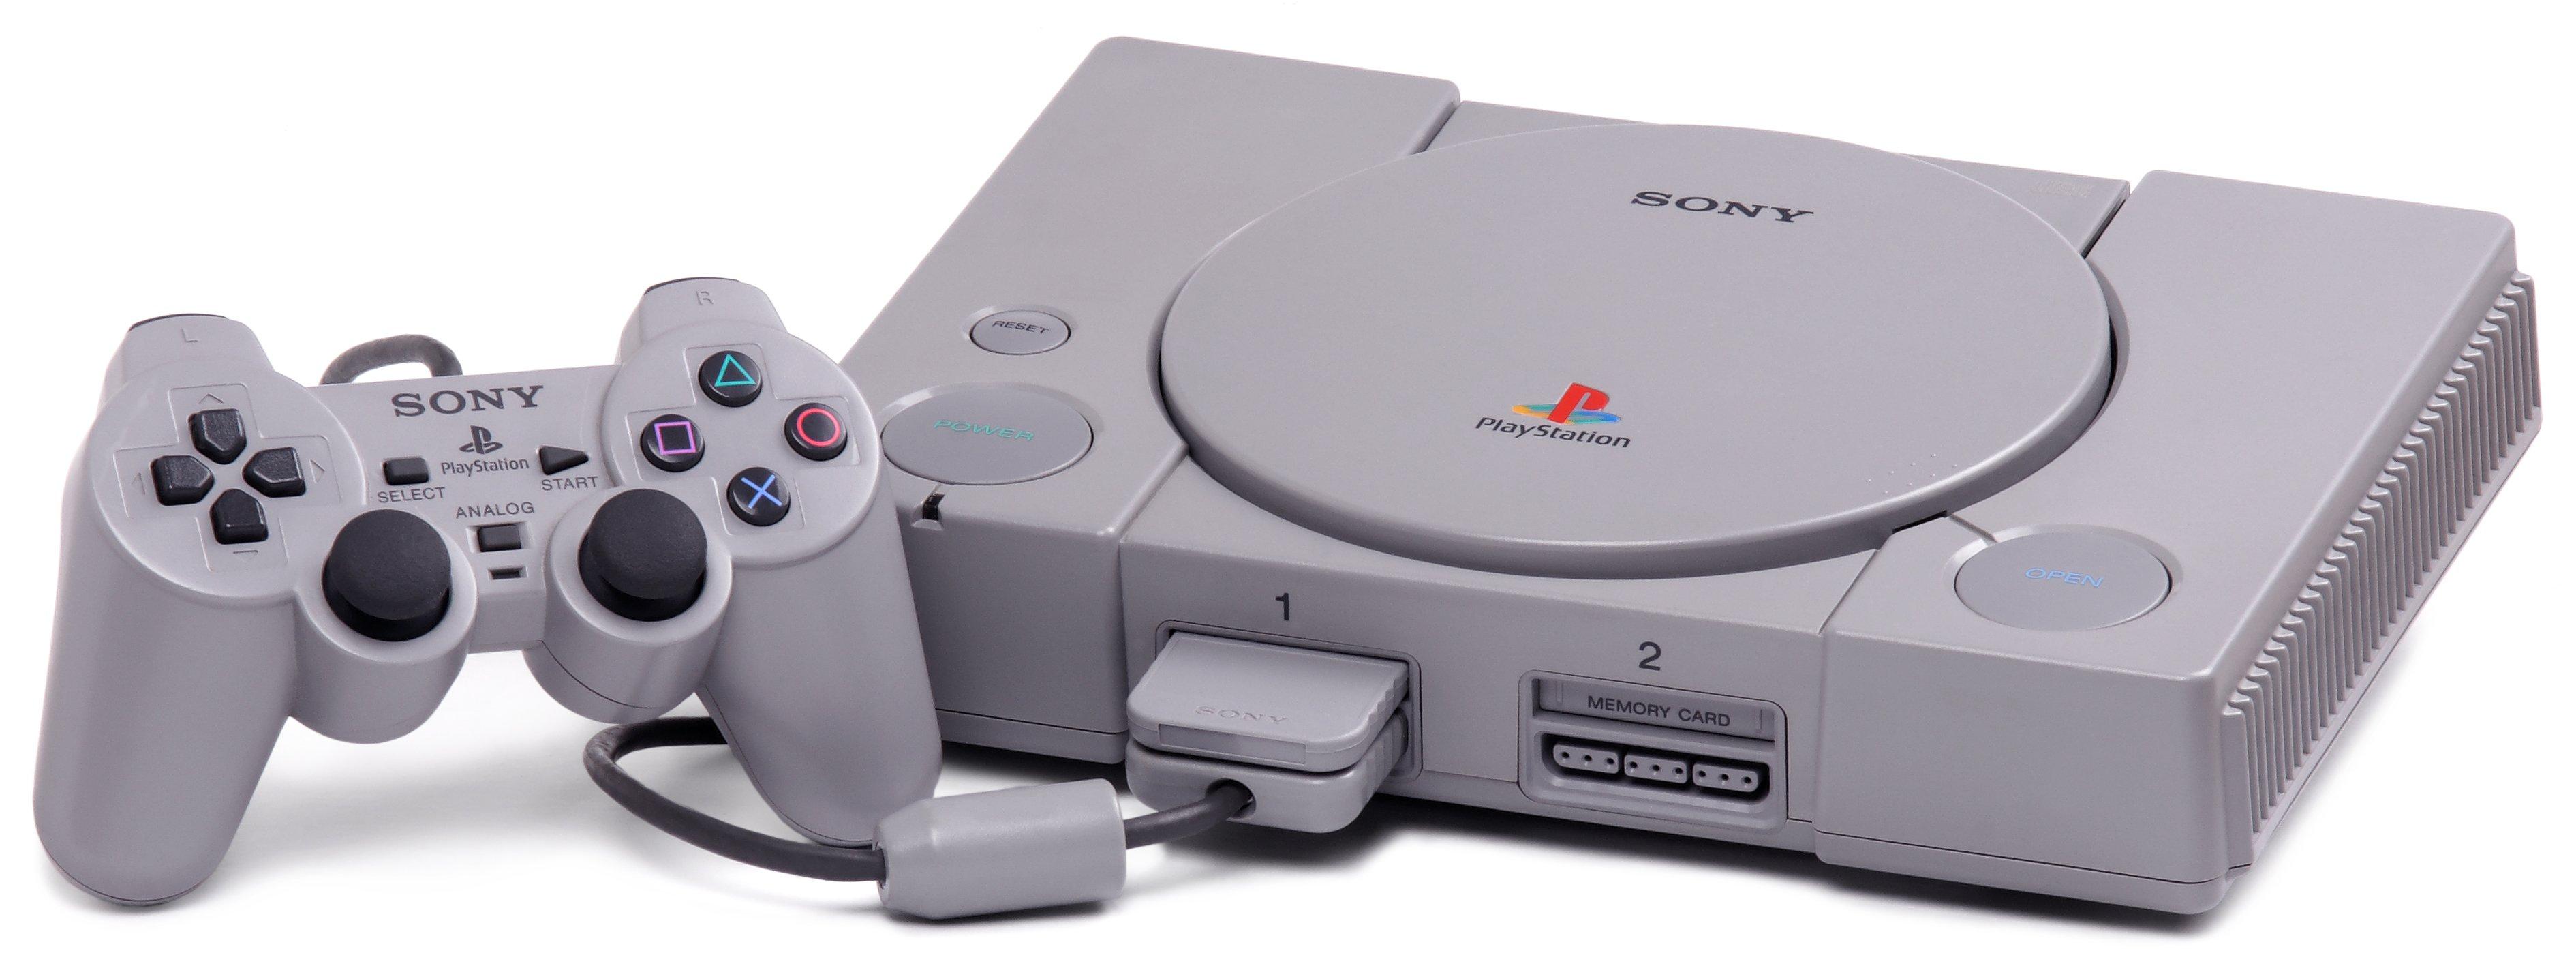 industri game console